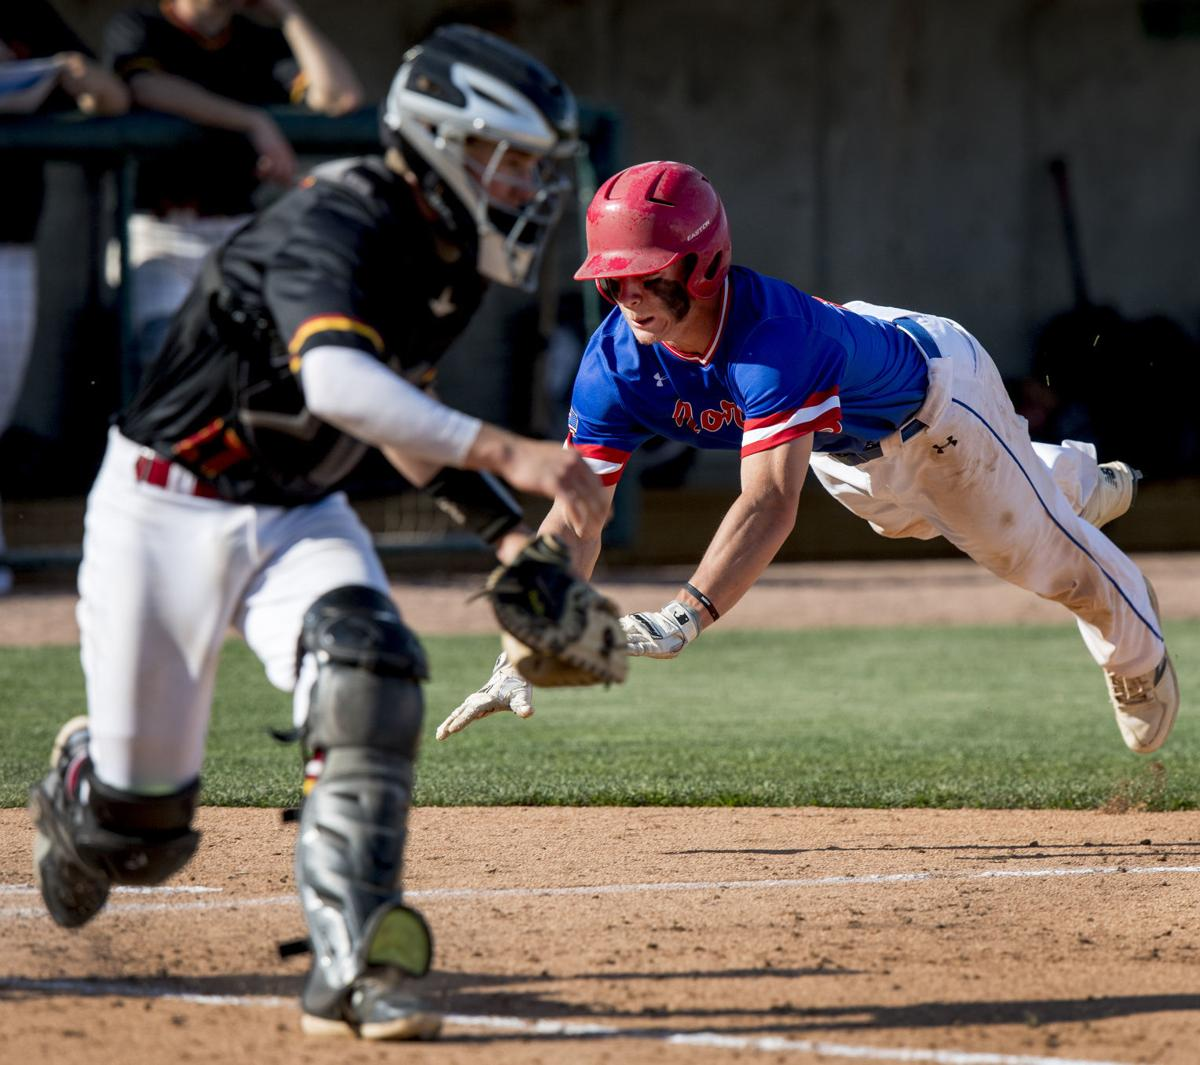 Class B state baseball, Roncalli vs. Norris, 5/16/18